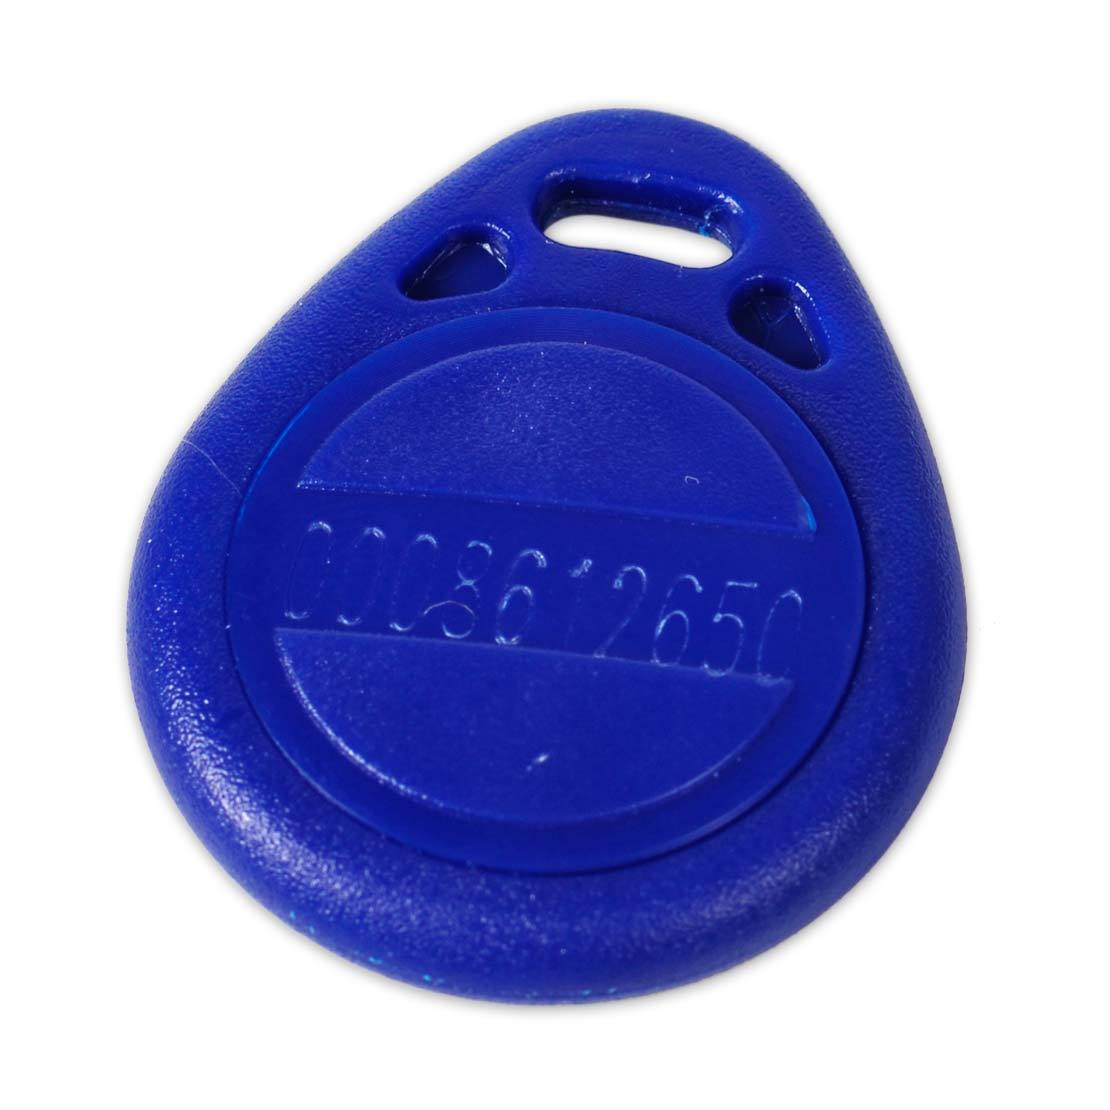 100pcs RFID Key-fobs 125KHz EM4100 Proximity ID Token Tag Key Keyfobs Chain Tool